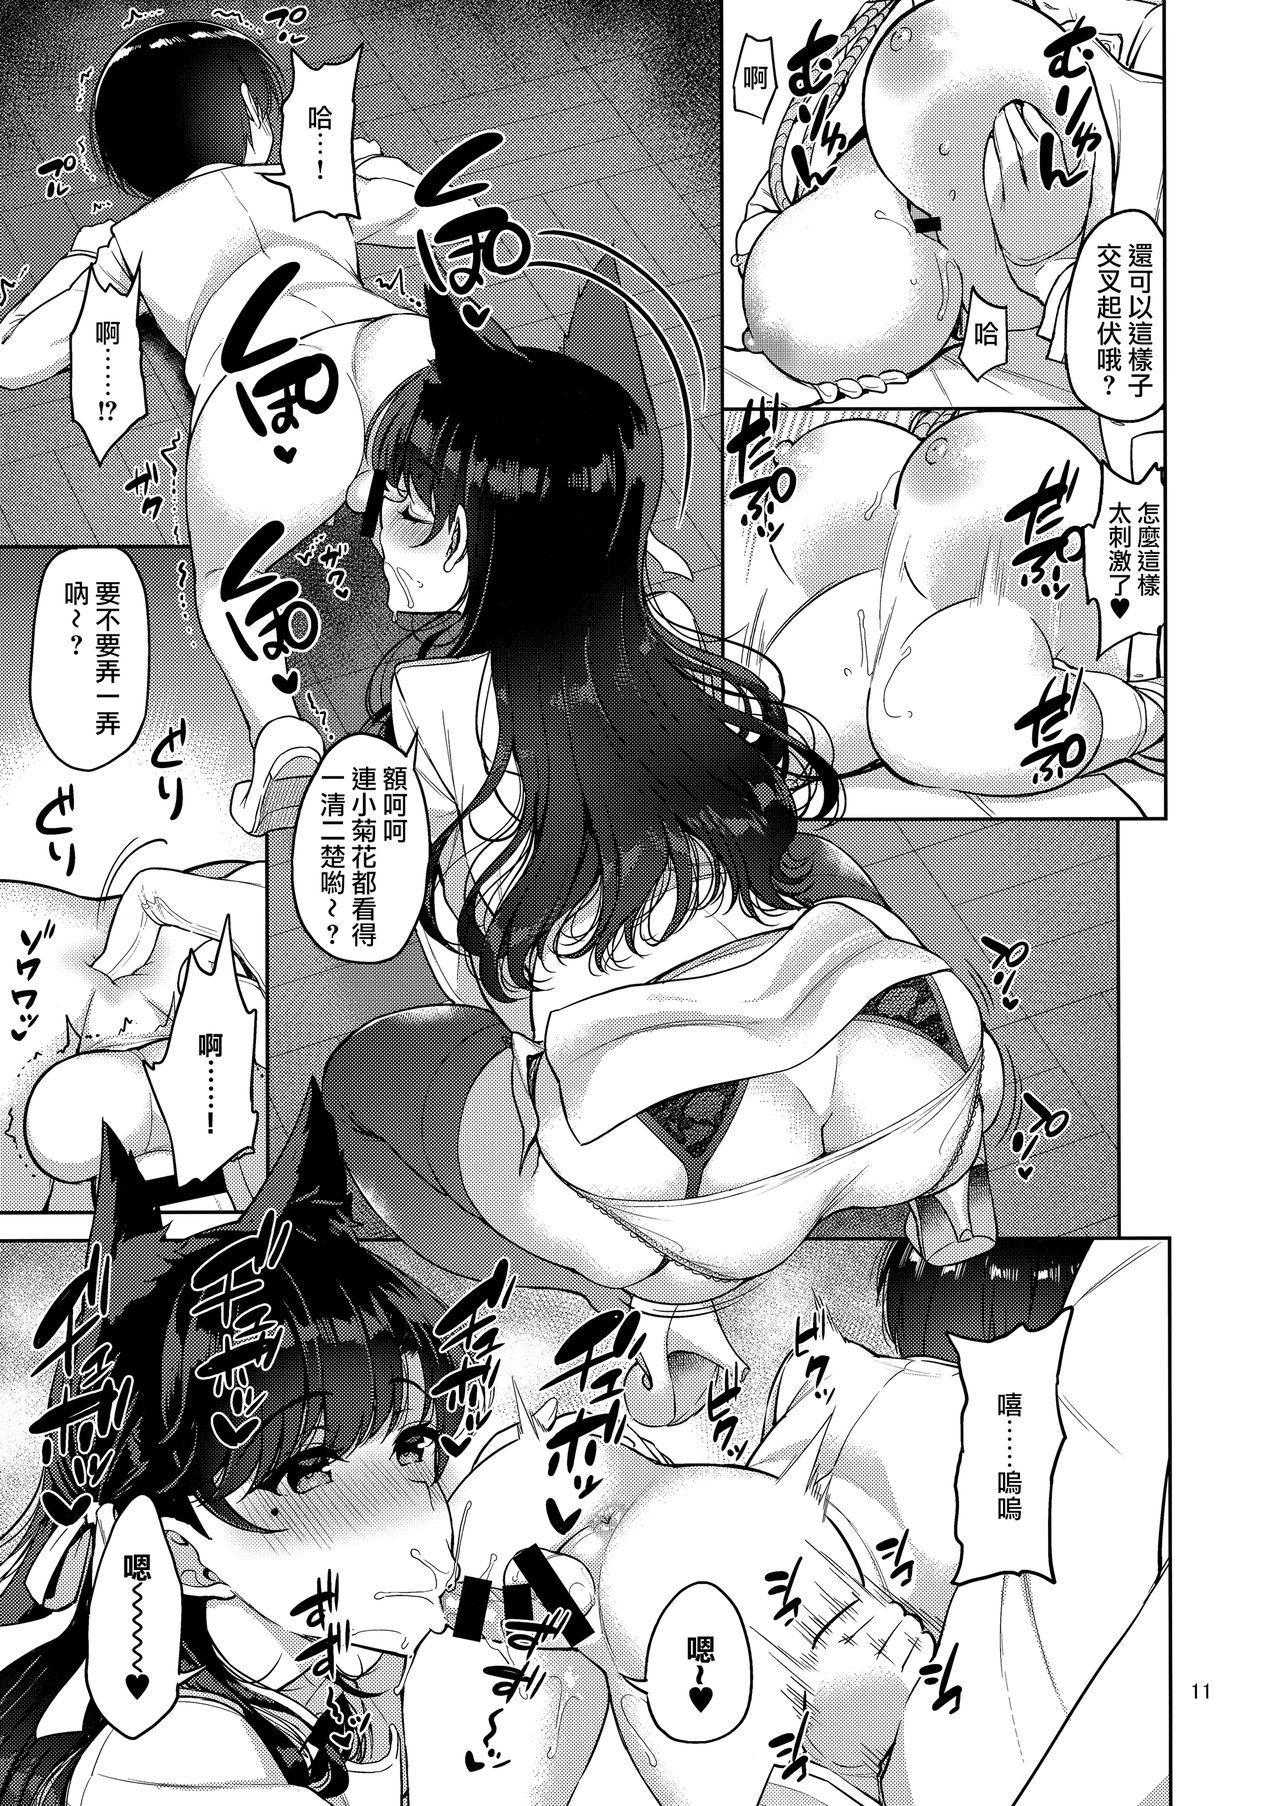 (C93) [Akapenguin (Asahina Hikage)] Atago-san to Takao-san (Azur lane) [Chinese] [無邪気漢化組] 10